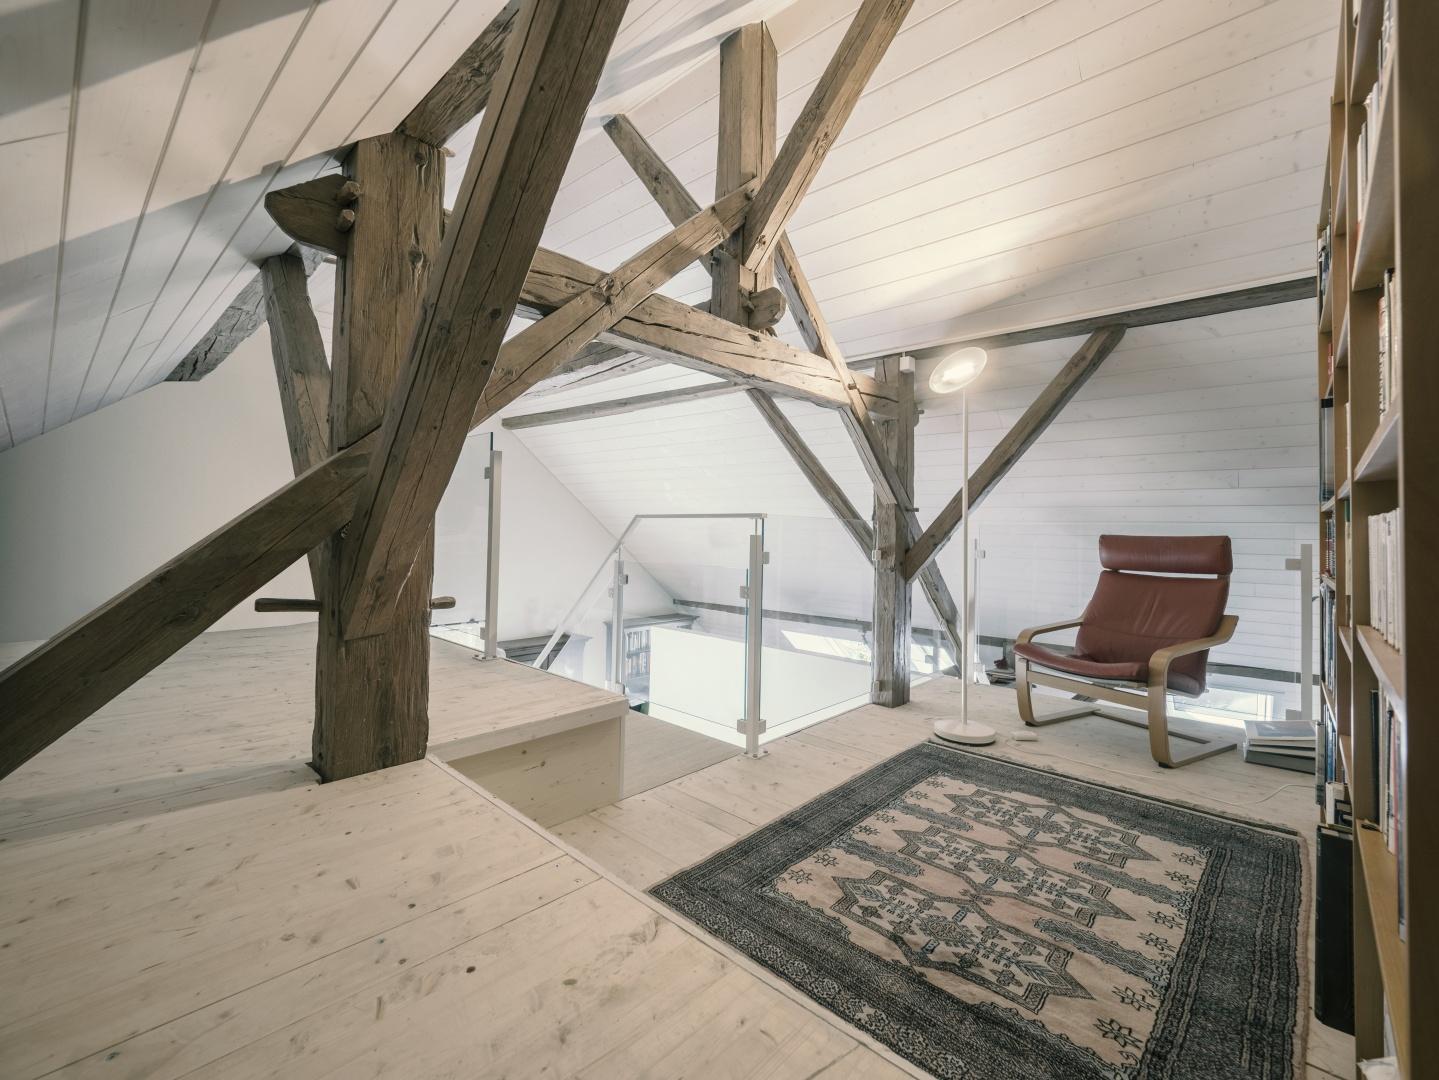 mezzanine © Michael Hartwell